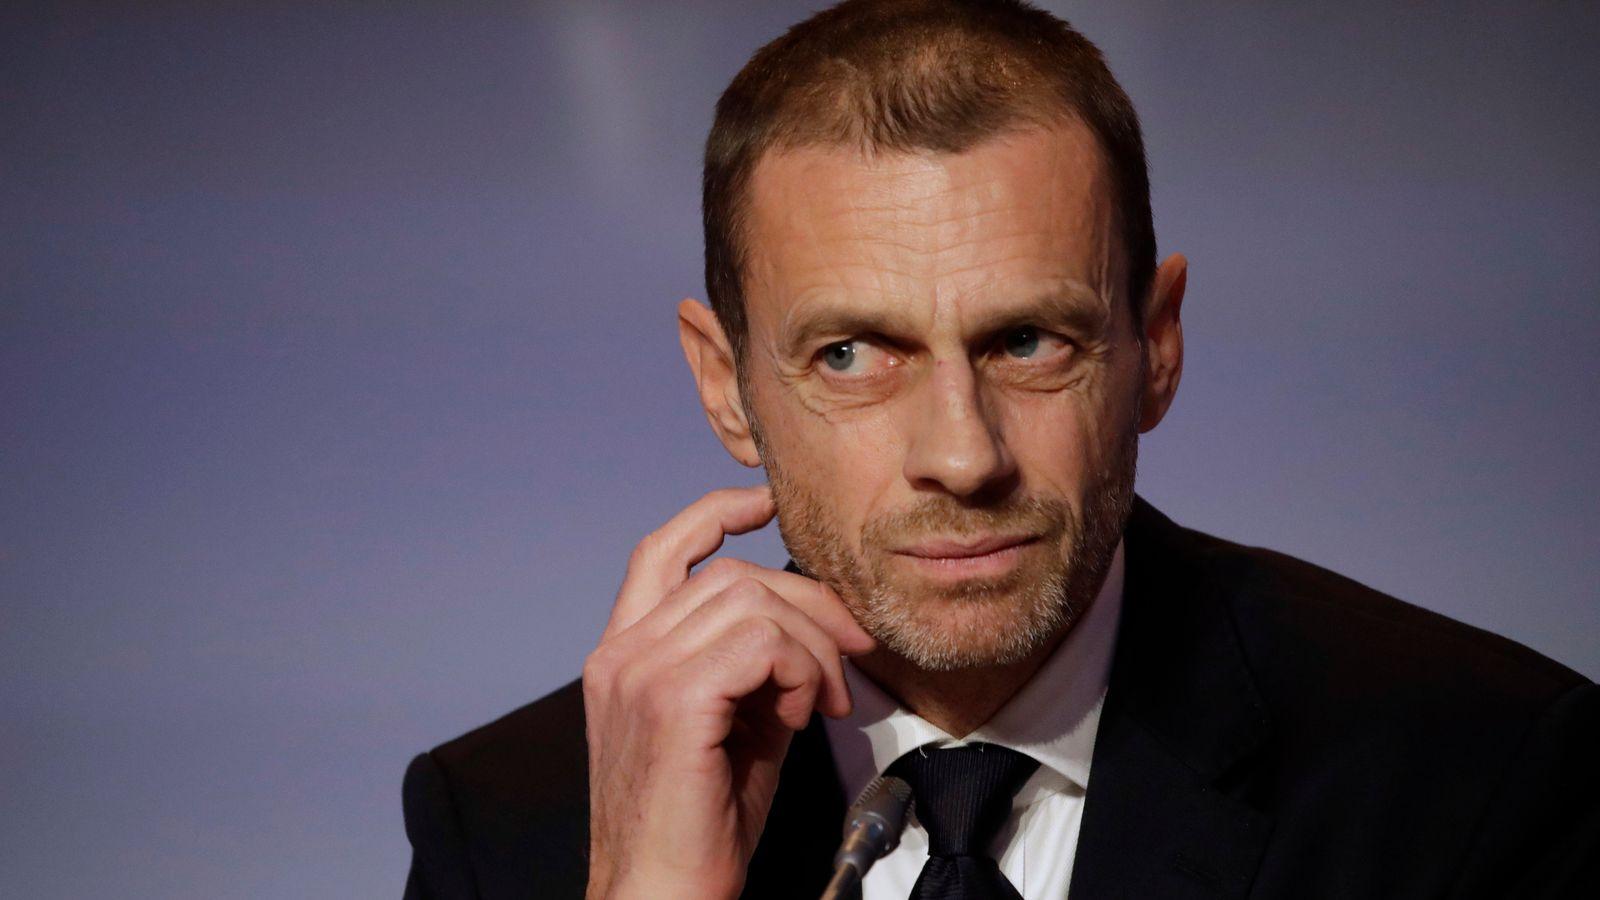 European Super League: UEFA president Aleksander Ceferin condemns 'disgraceful' proposals